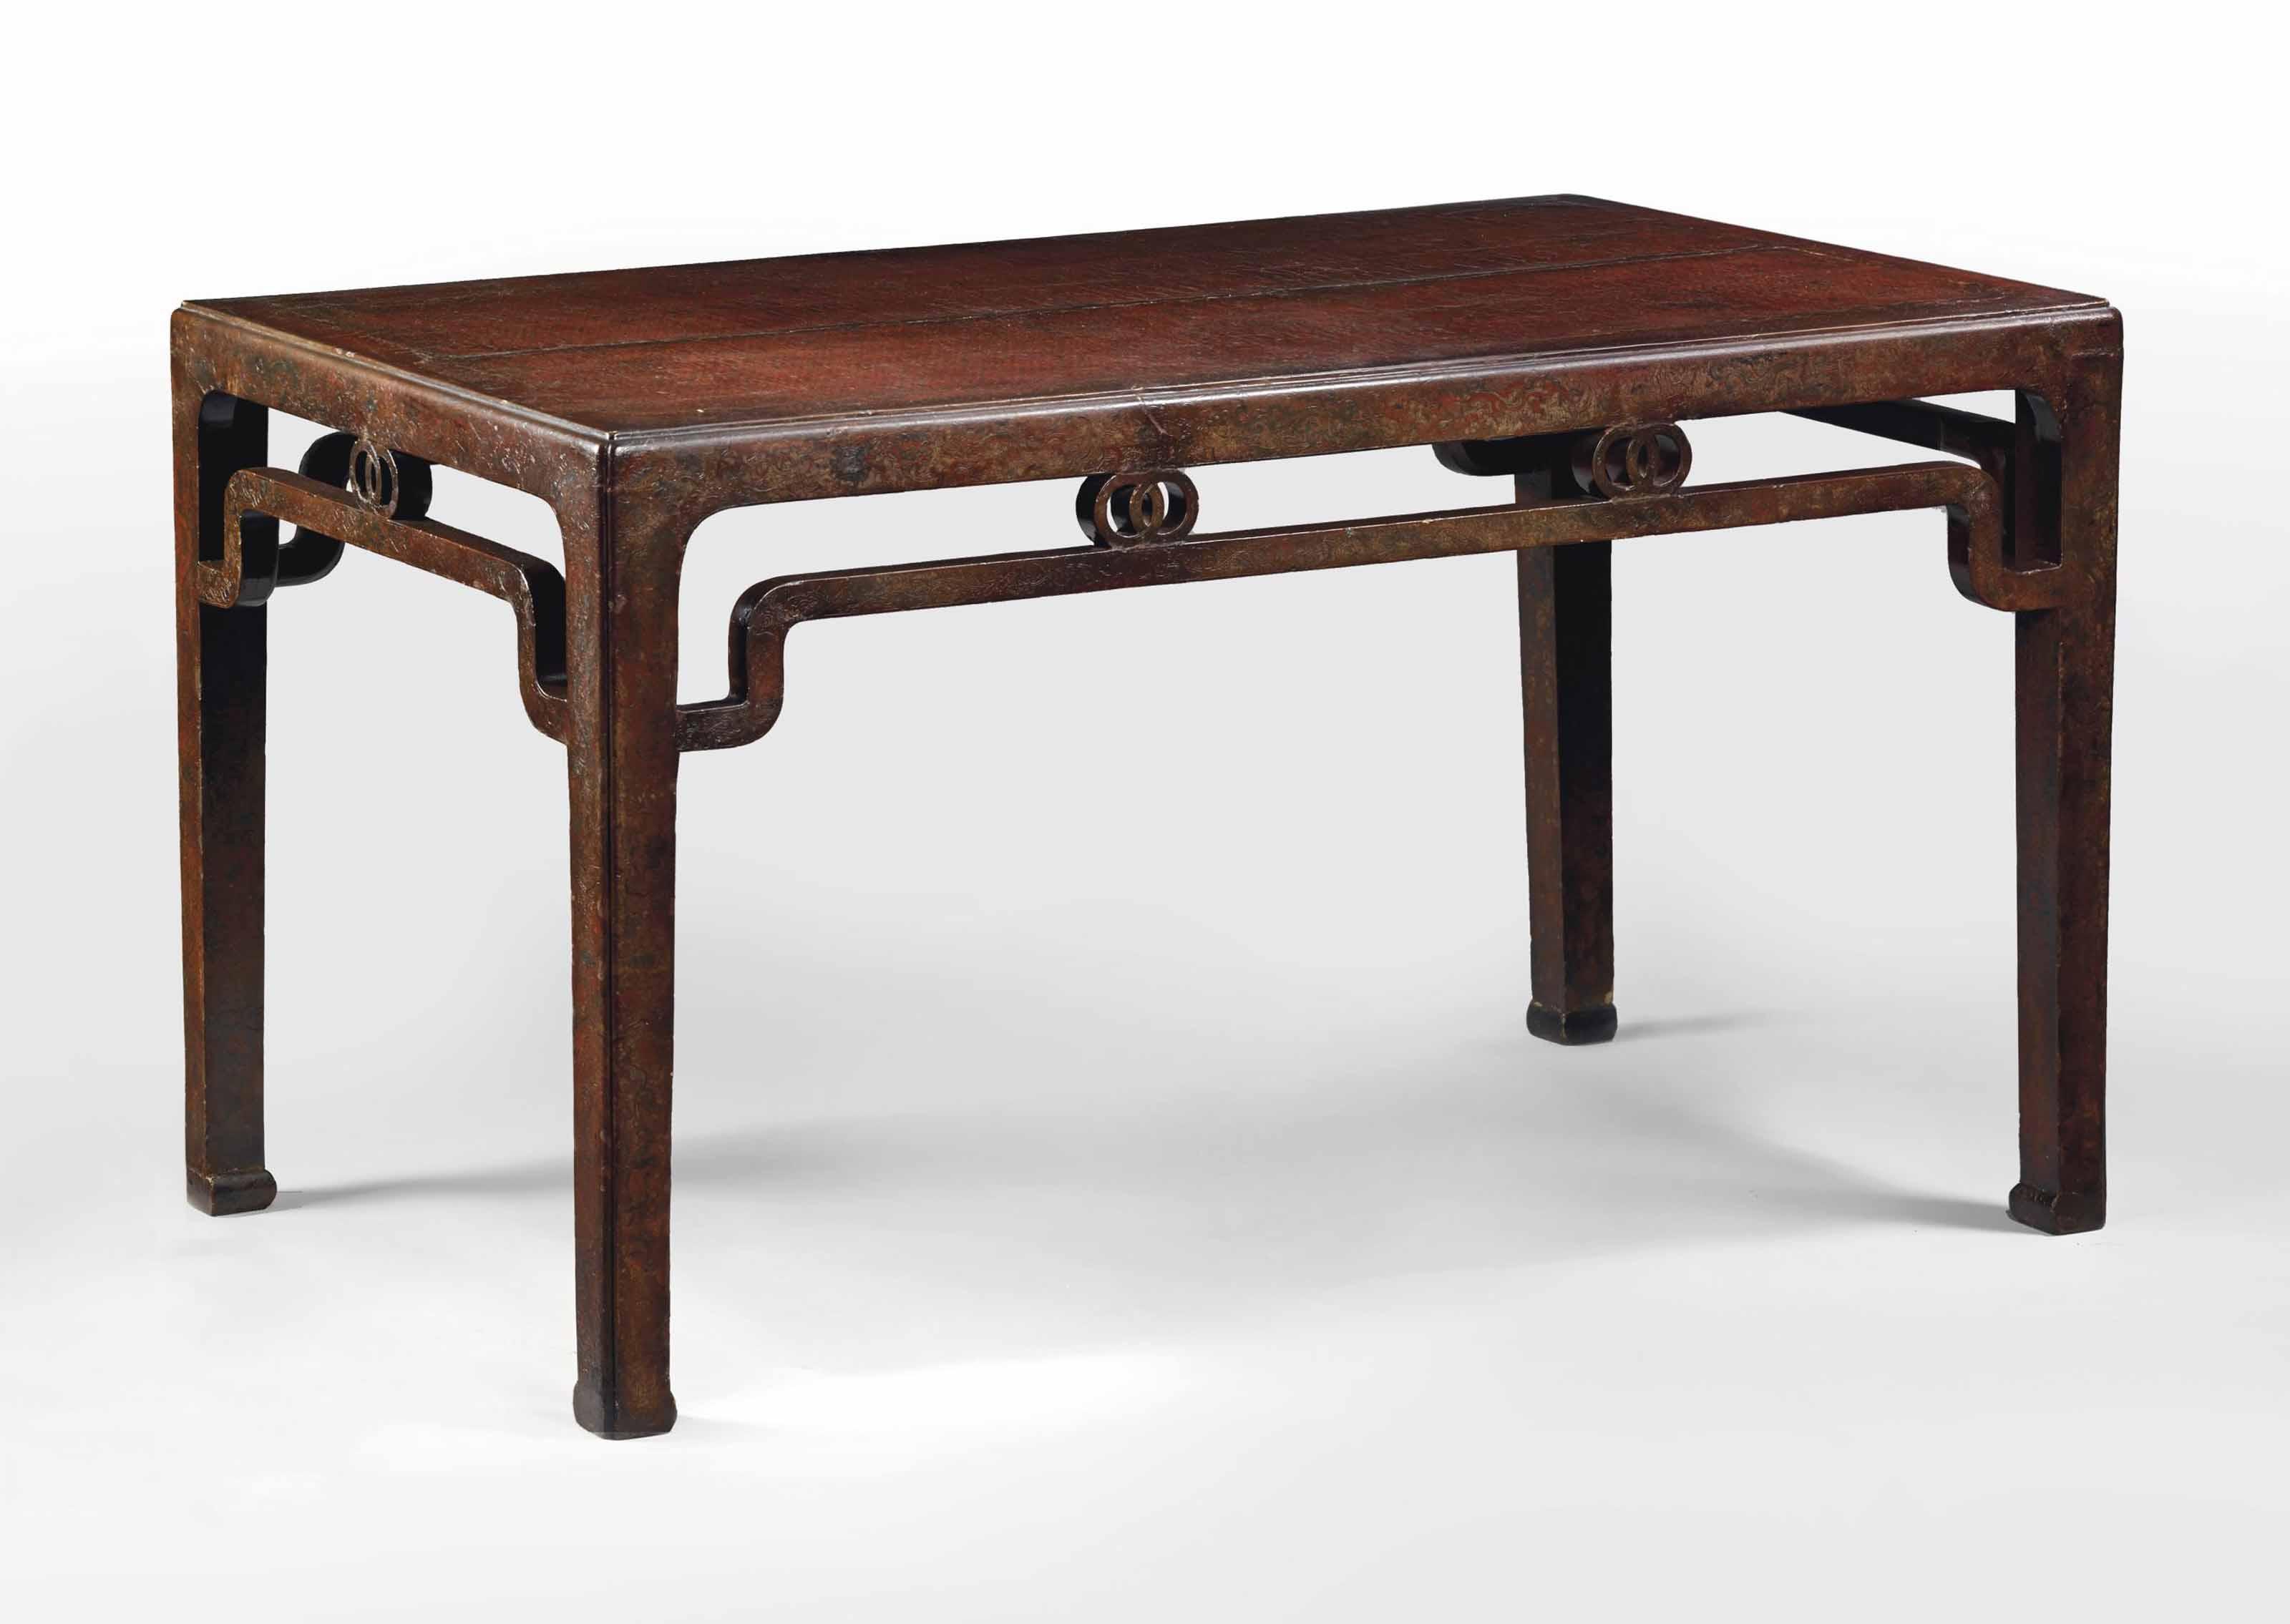 grande table en bois laque chine dynastie ming xviieme. Black Bedroom Furniture Sets. Home Design Ideas